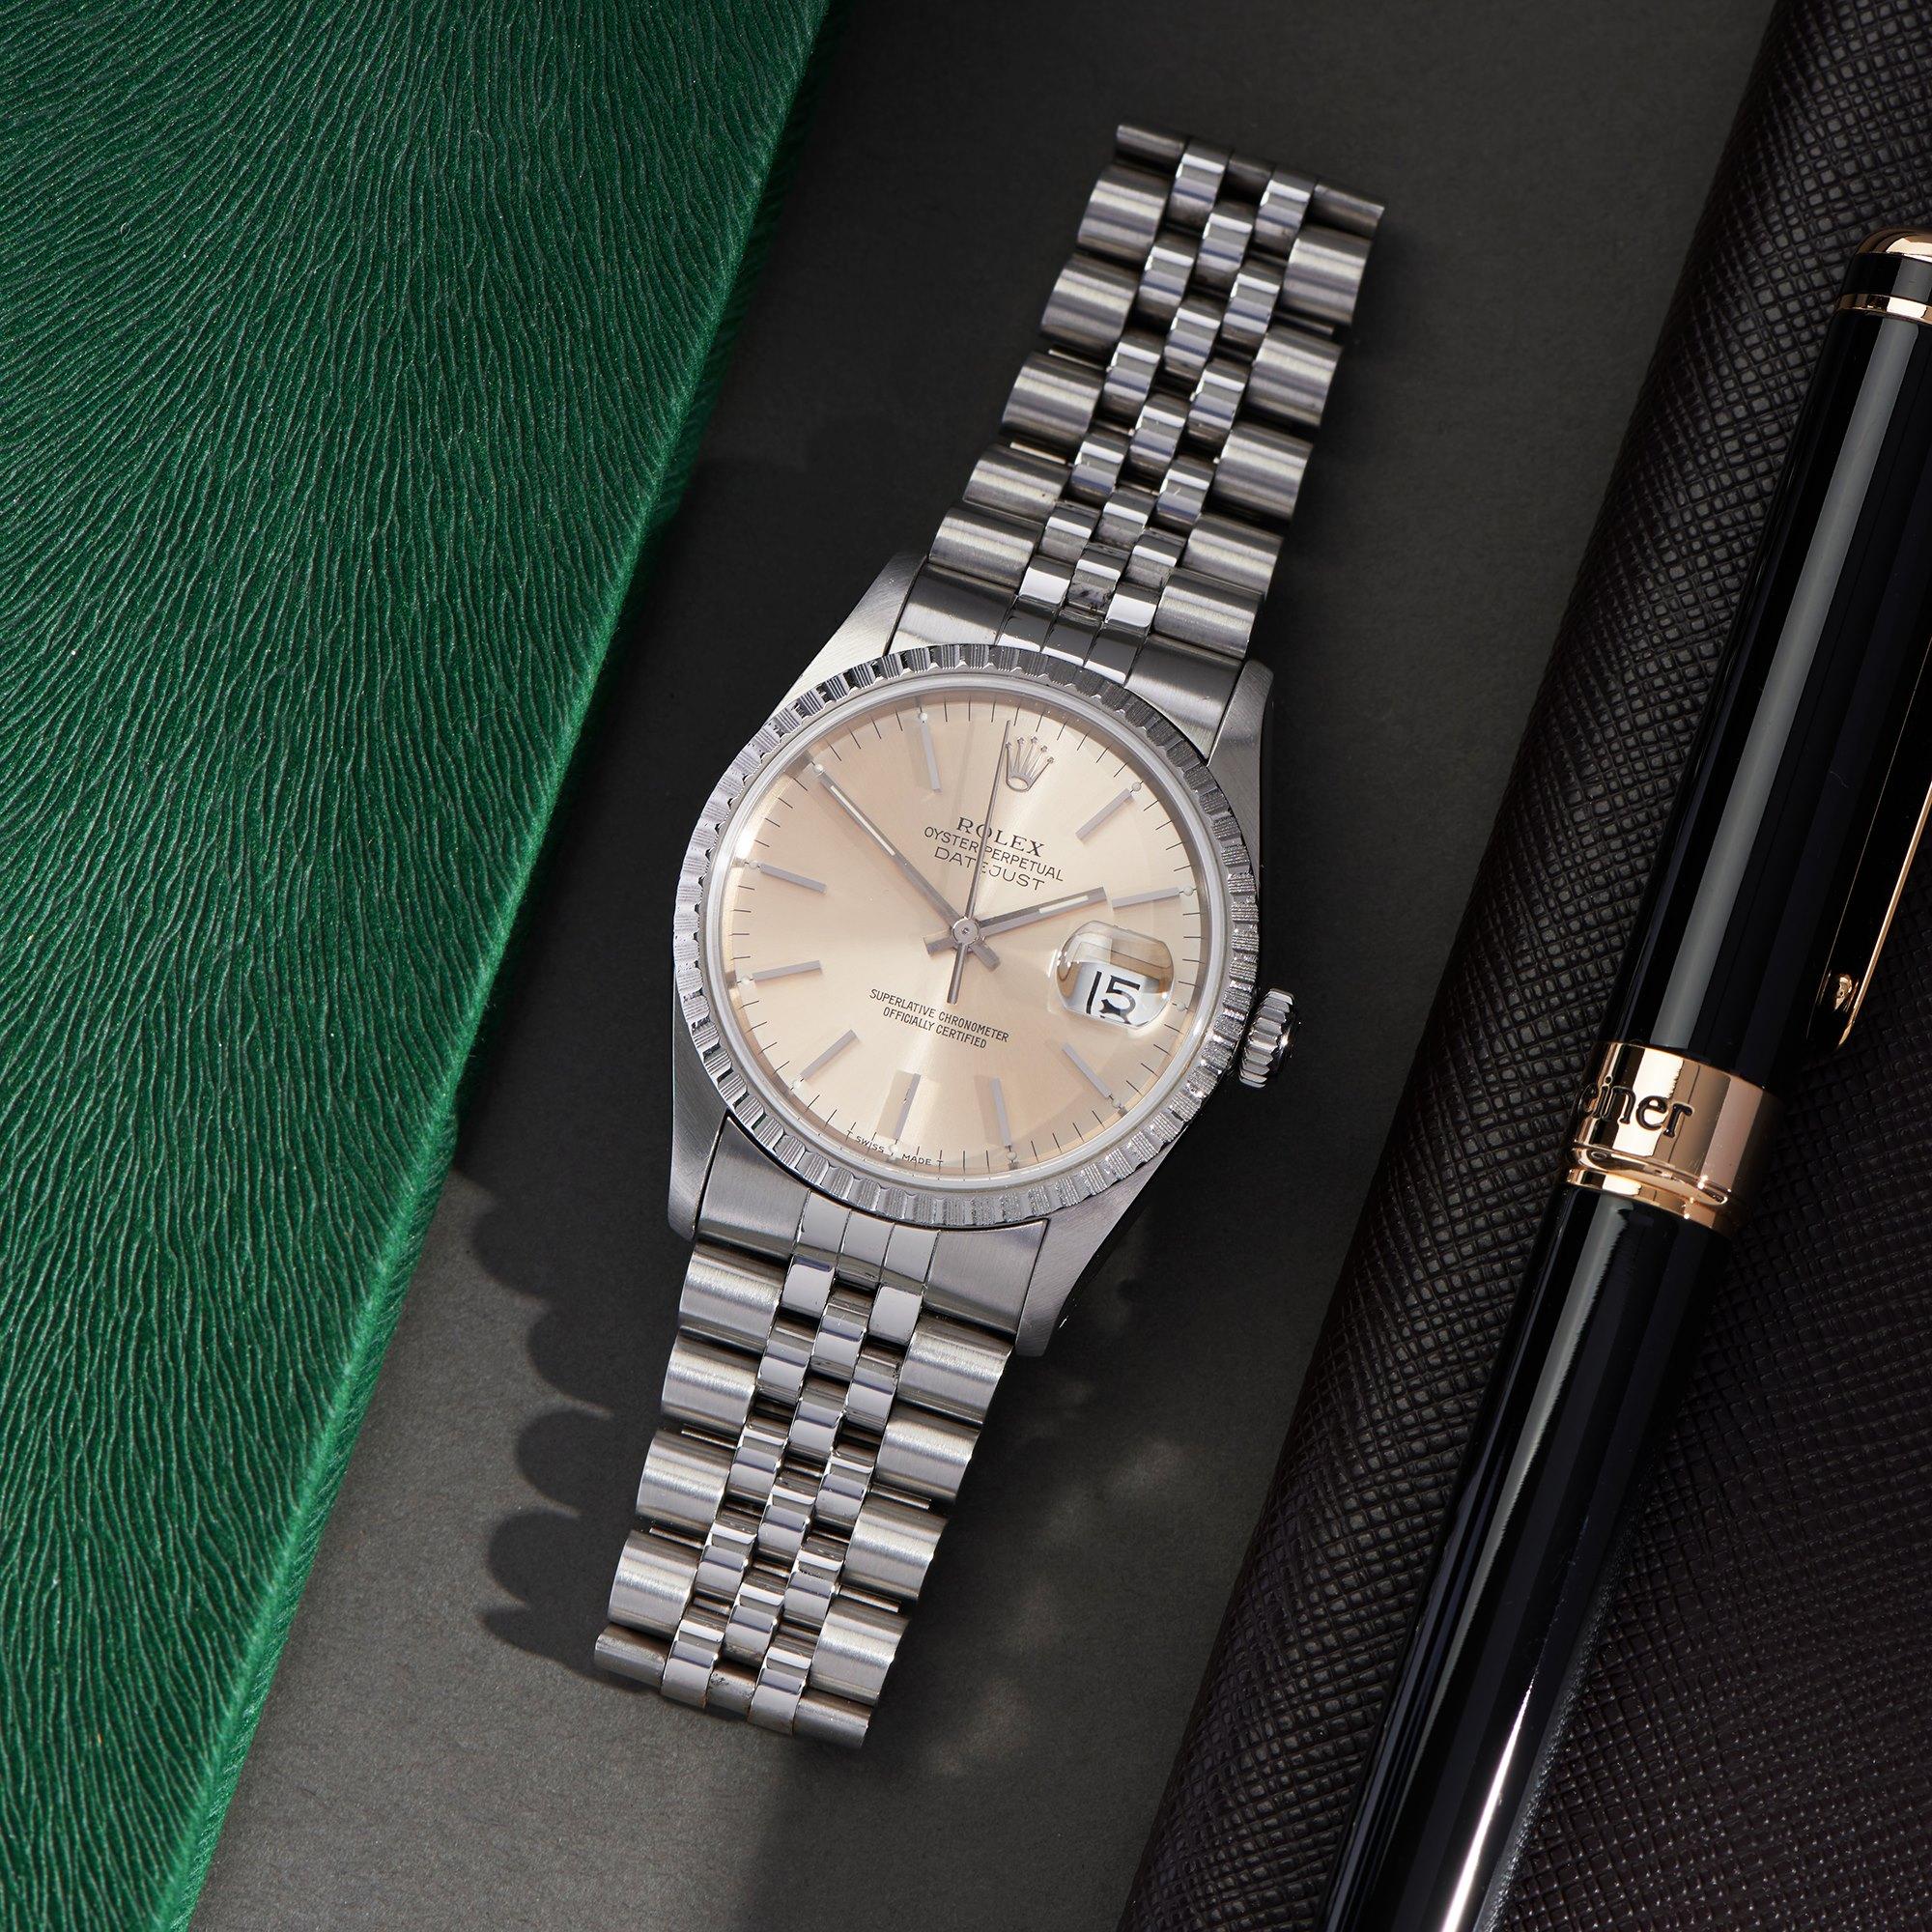 Rolex Datejust 36 18K White Gold & Stainless Steel 16220